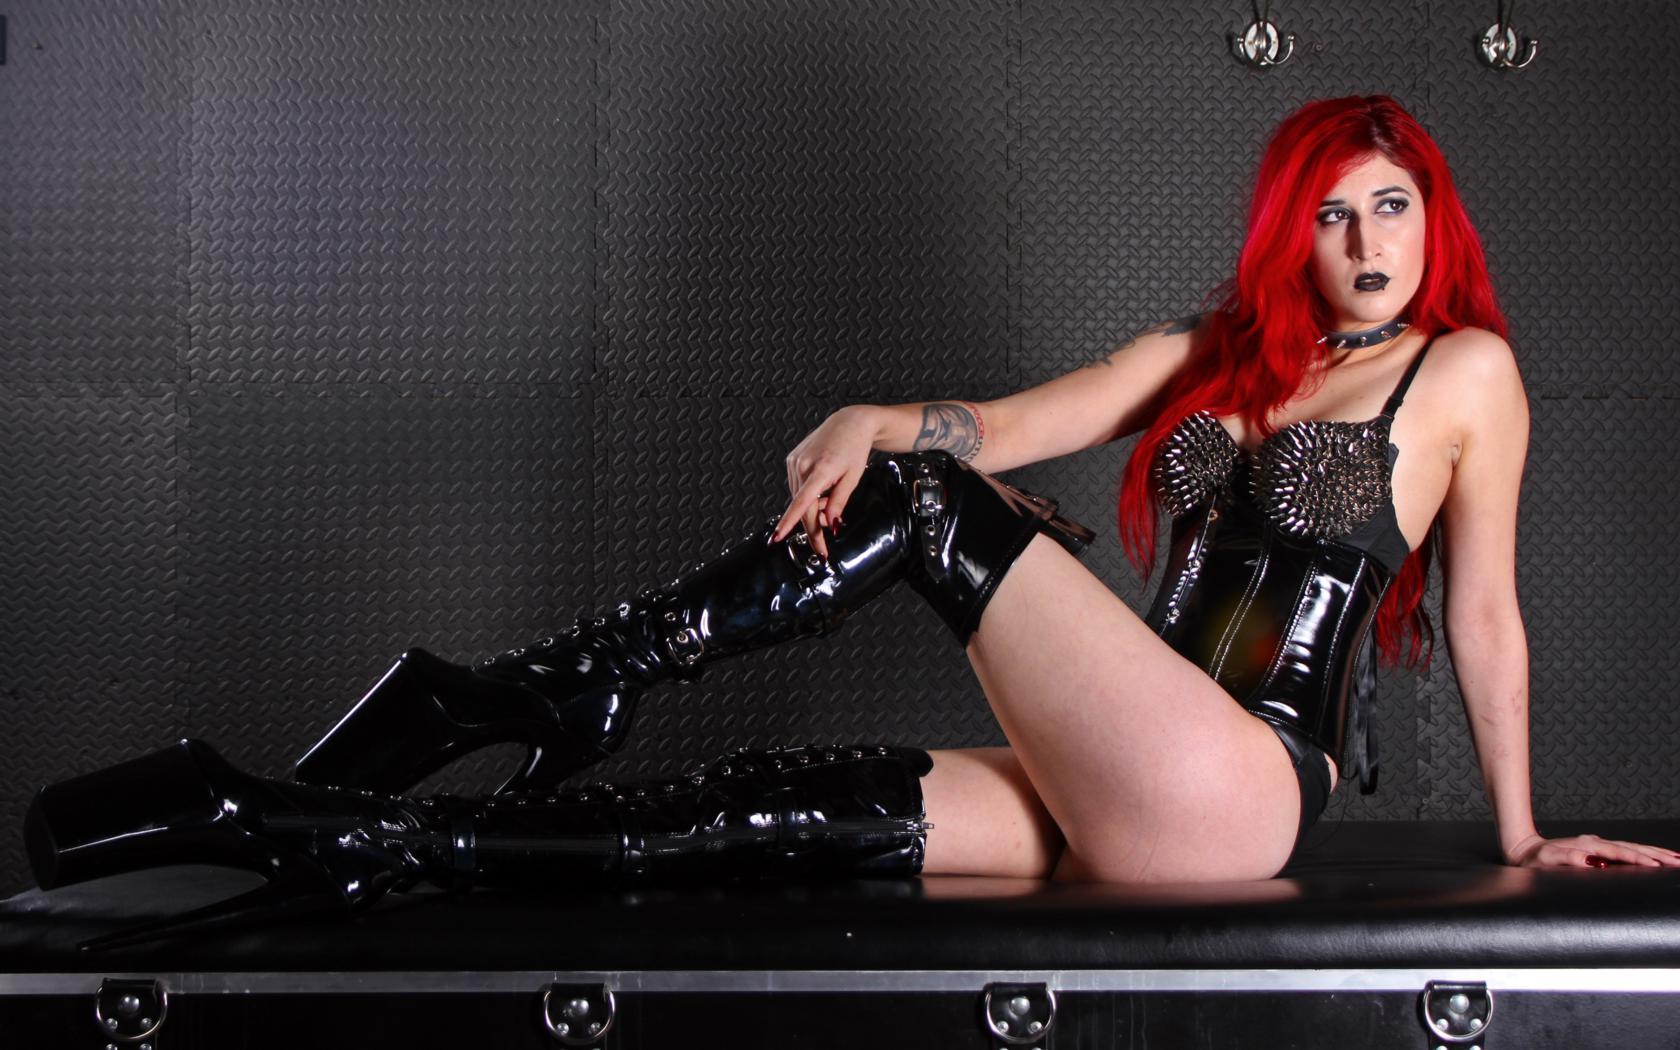 Download photo 1680x1050, mistress synful, german, domina